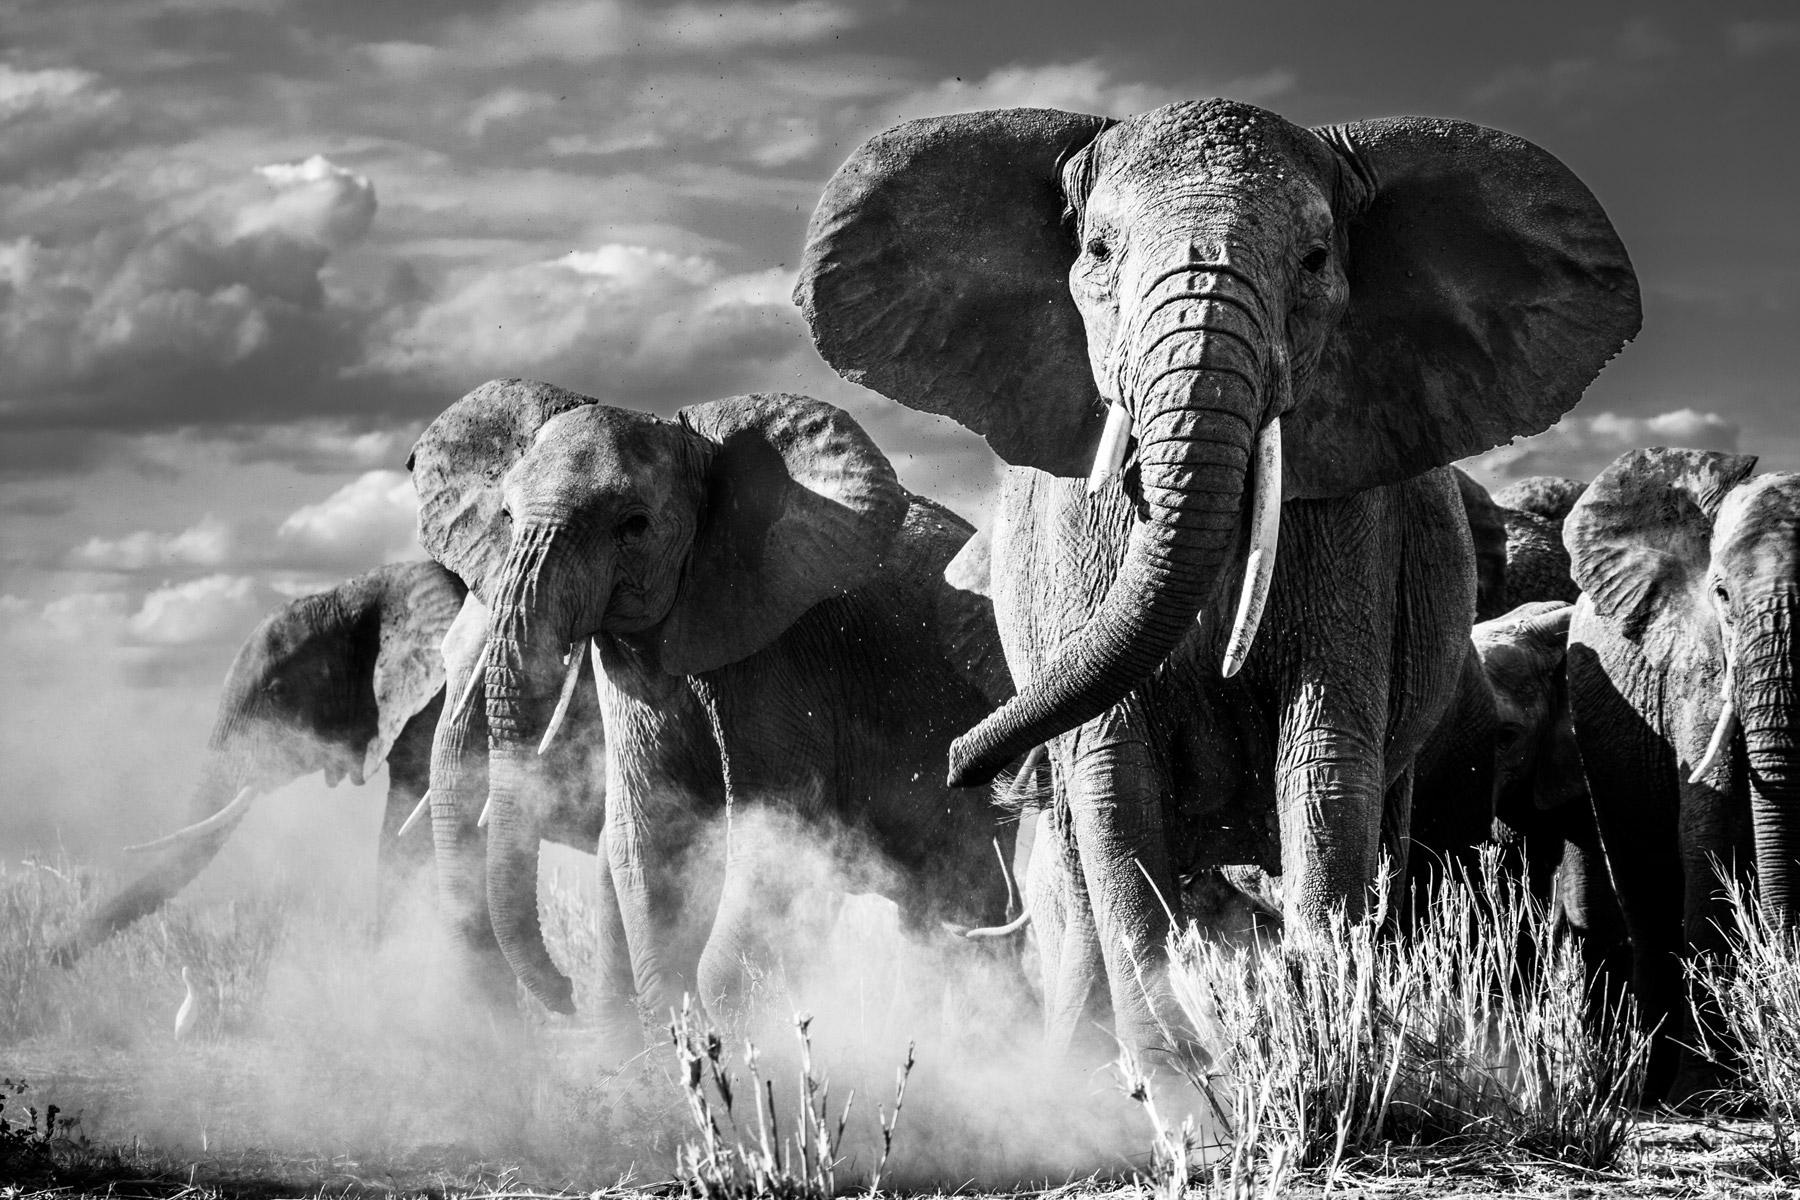 Elephant-mock-charge-Raisinphoto.com-3